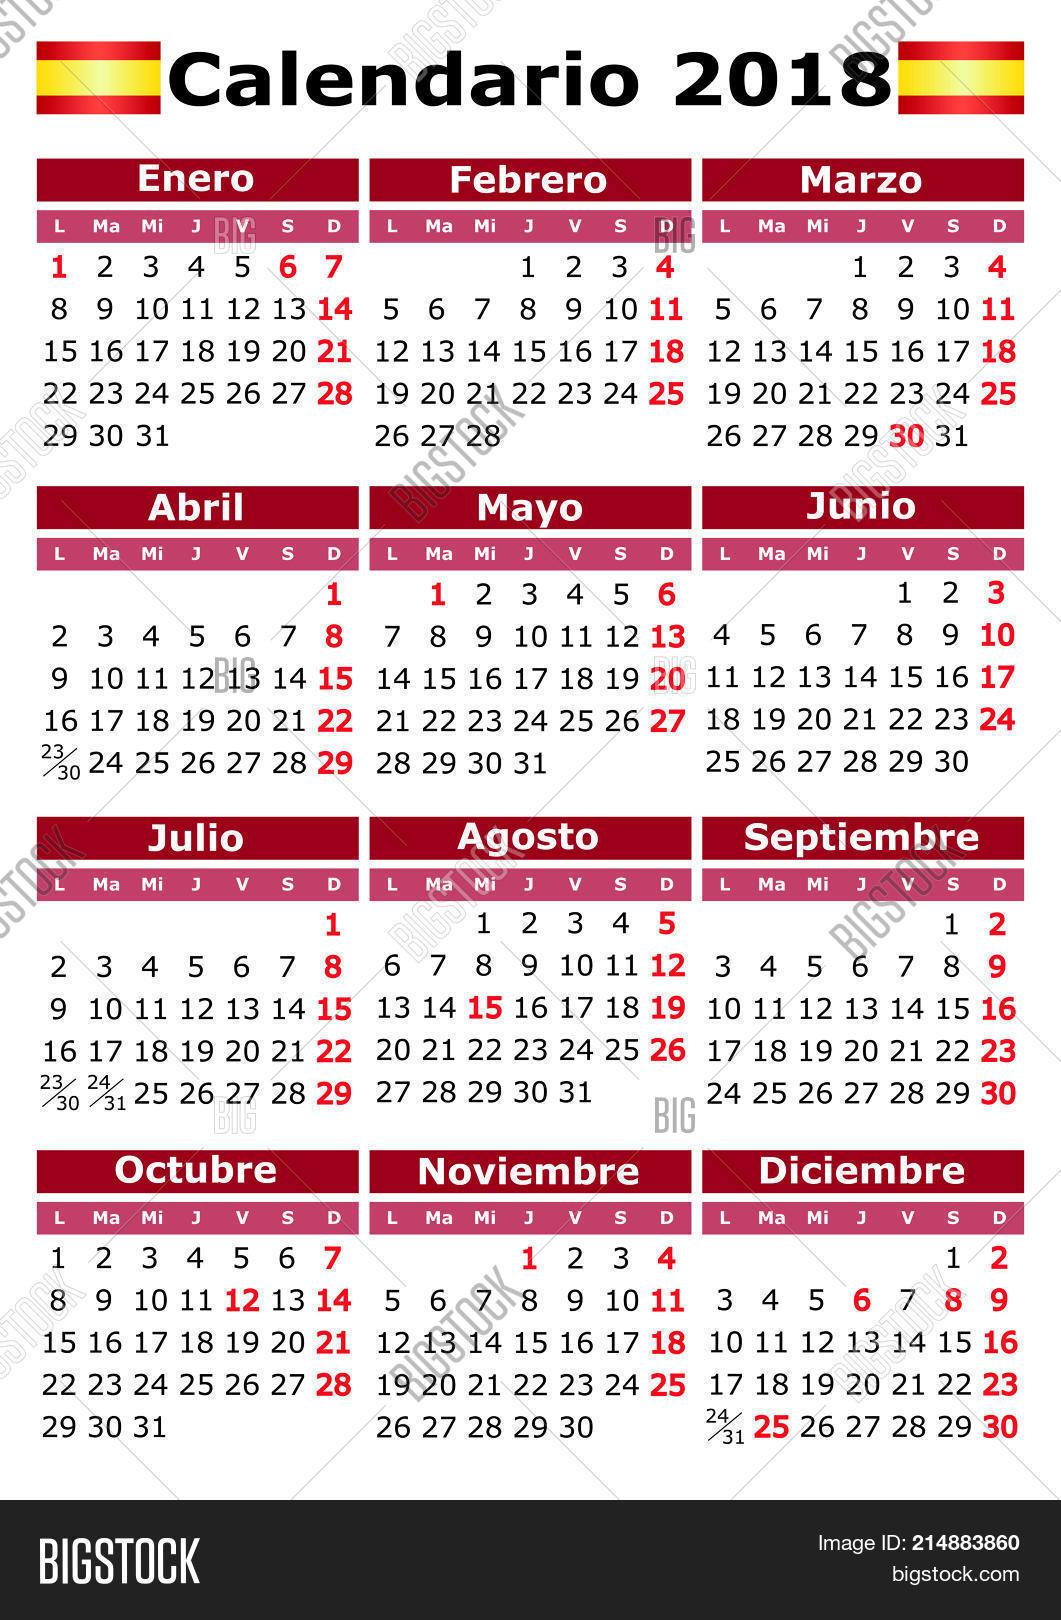 Calendar Days Of The Week In Spanish.Spanish Calendar 2018 Vector Photo Free Trial Bigstock